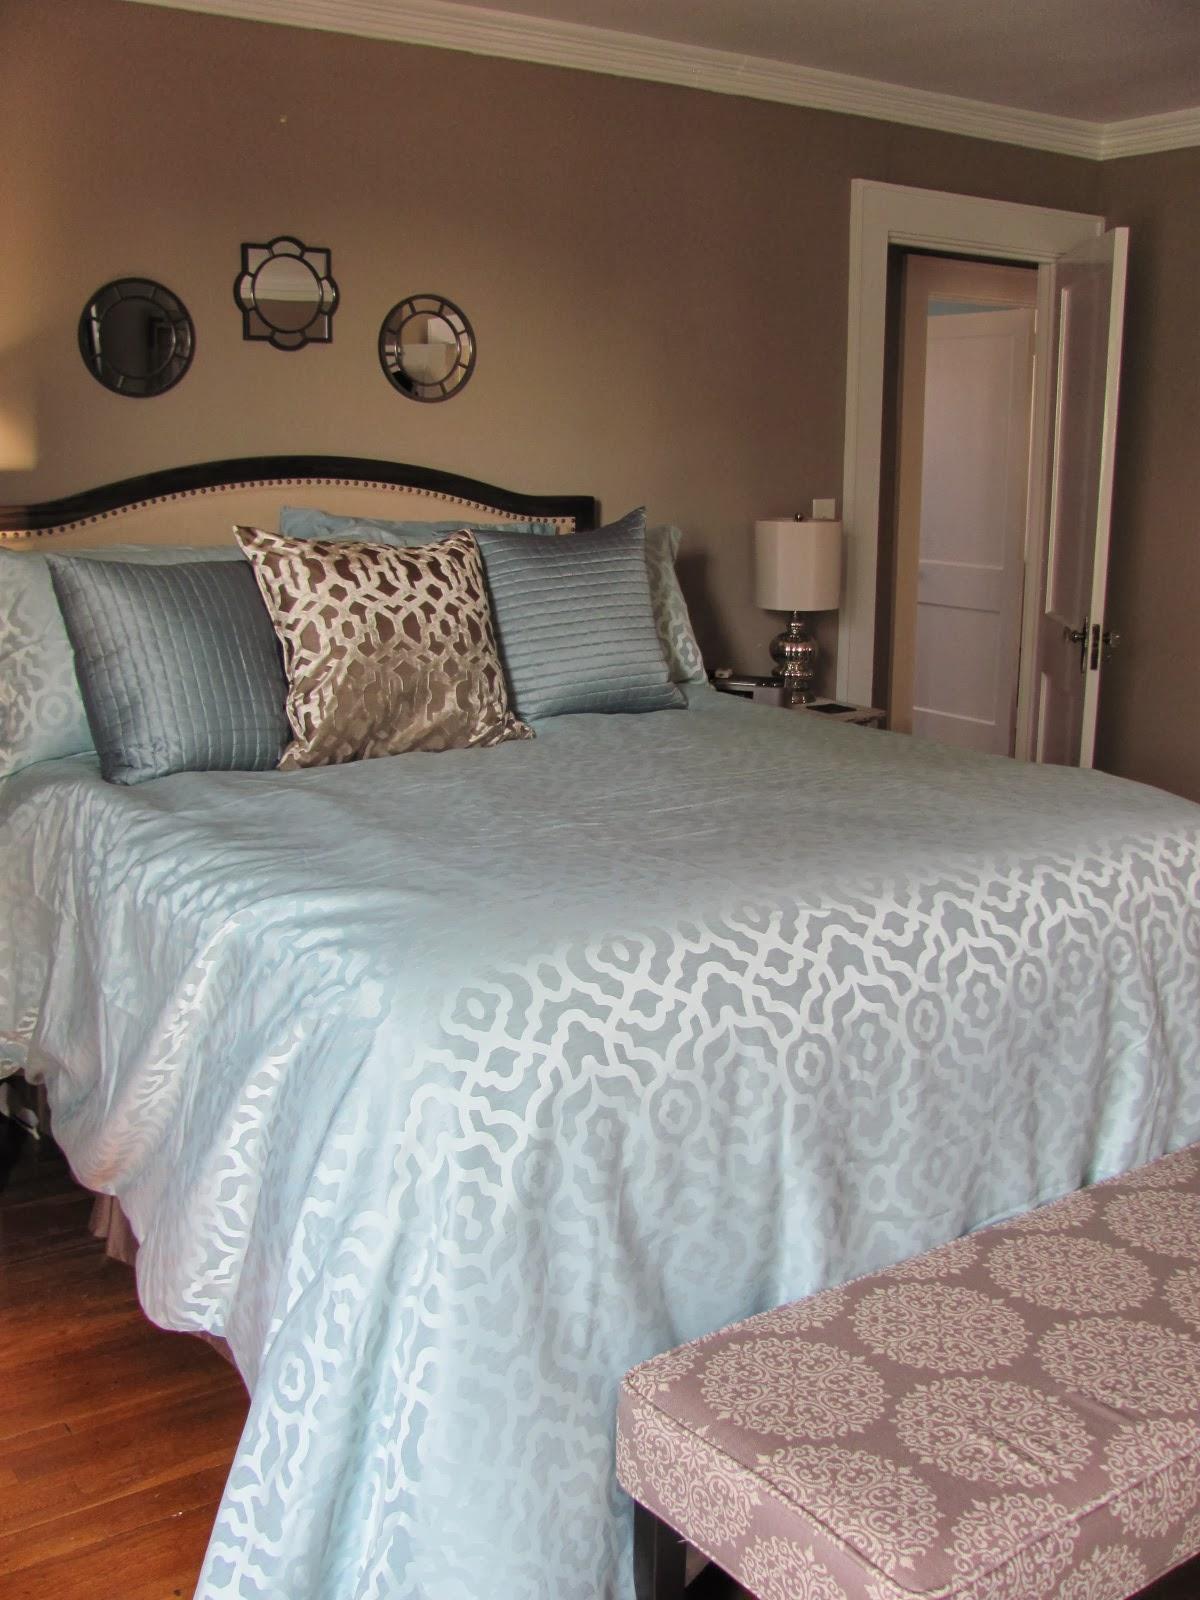 Modern bedroom after redesign by Professional Organizer Kristina Barrett